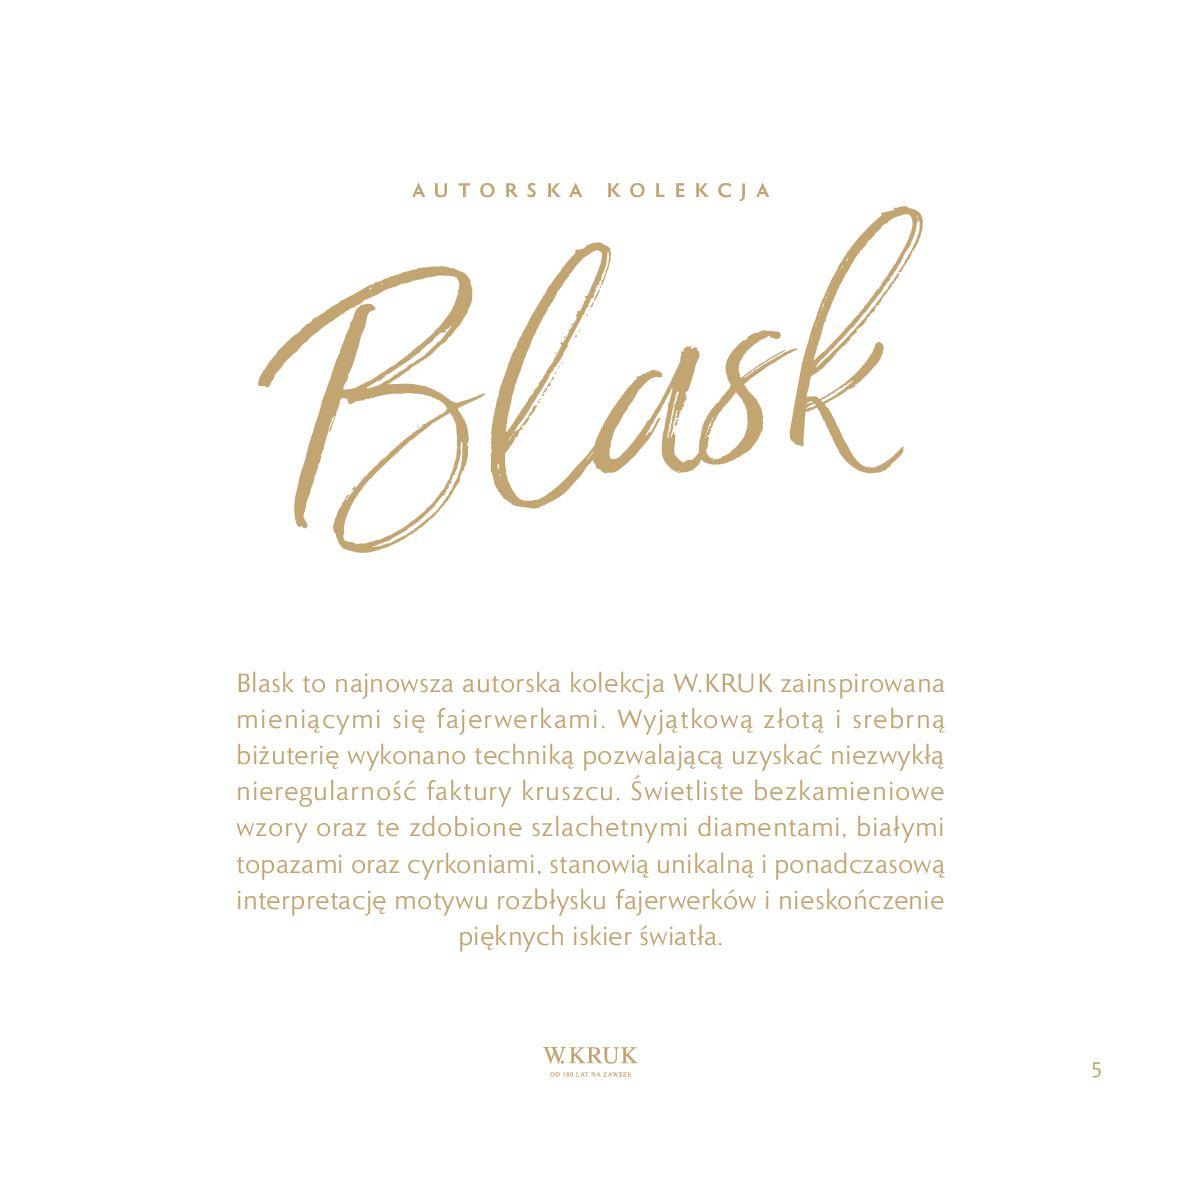 Gazetka W. KRUK: Katalog - Kolekcja Blask 2021-02-17 page-6